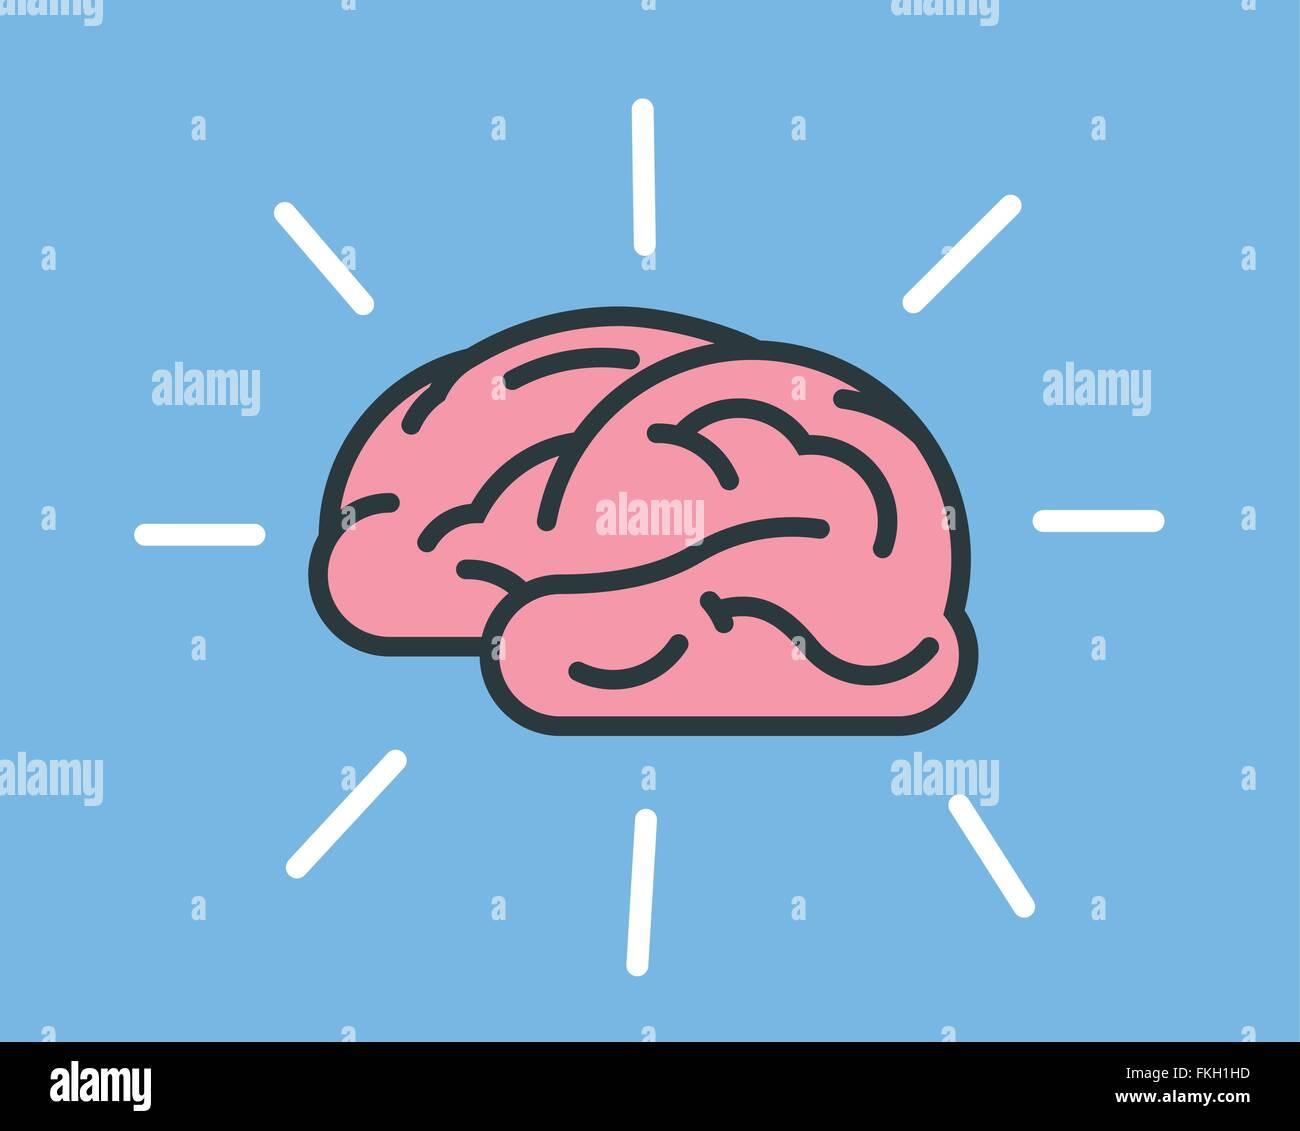 Radiating human brain icon - Stock Vector